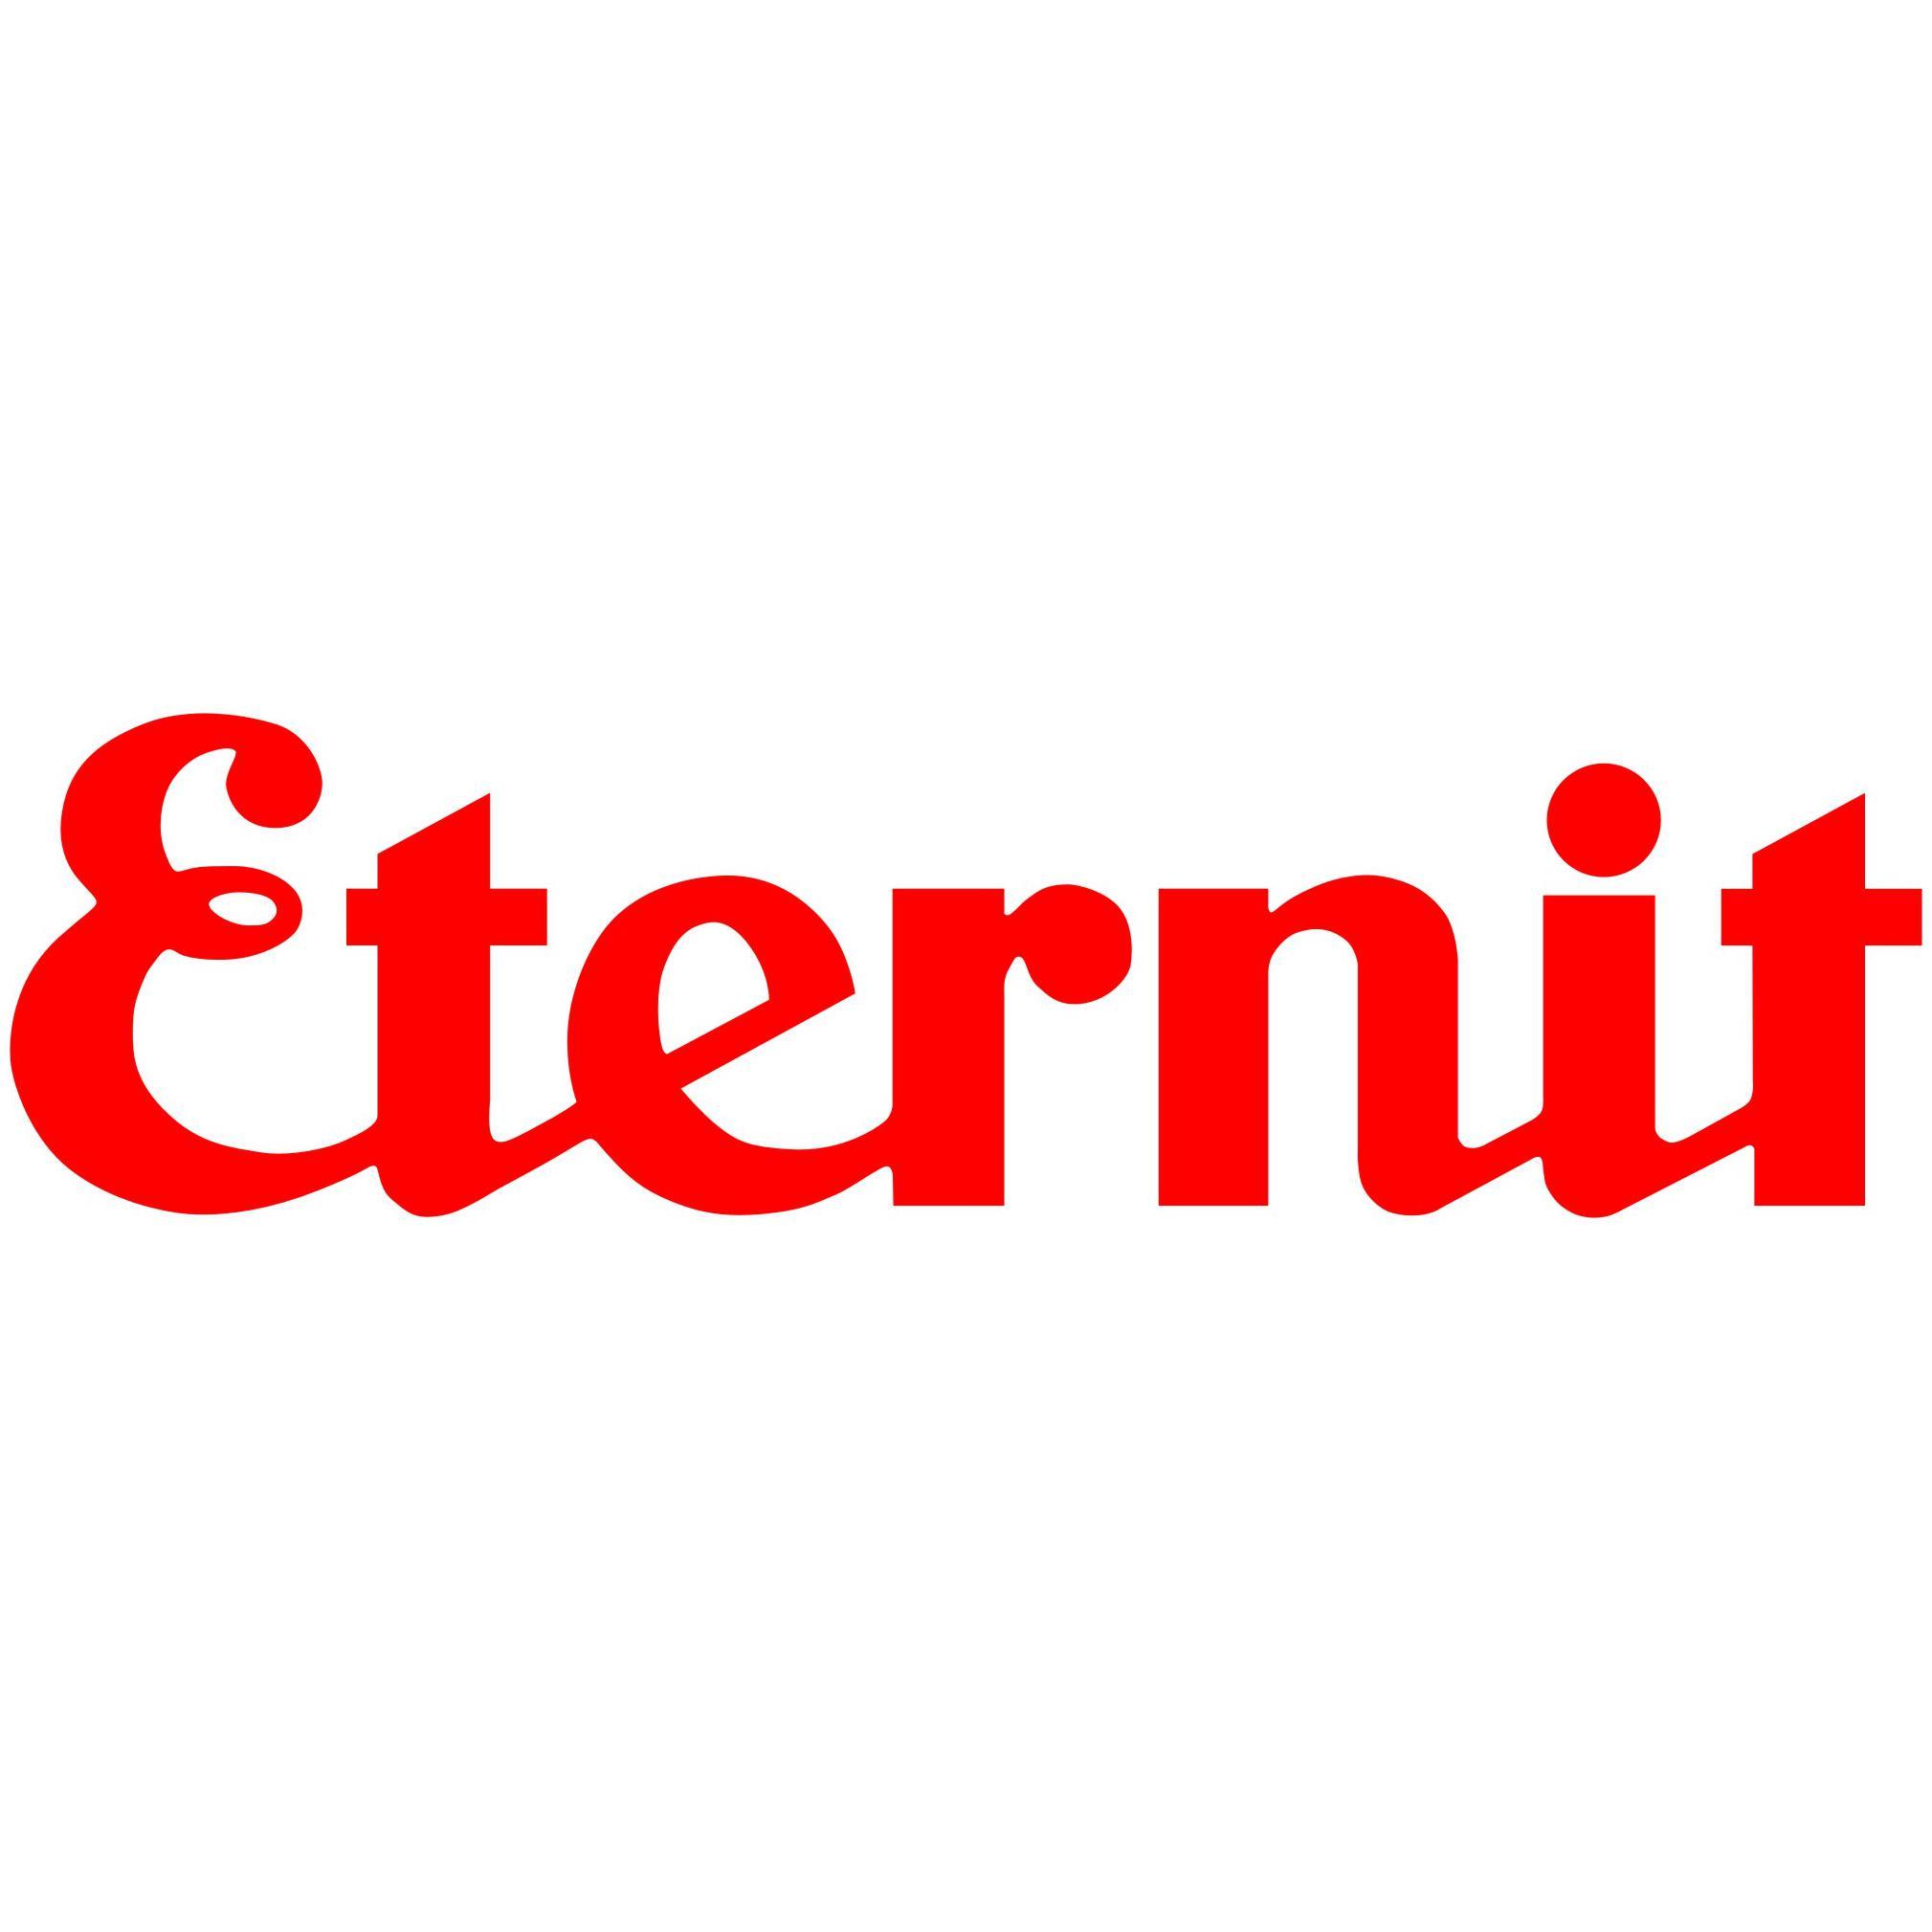 Eternit